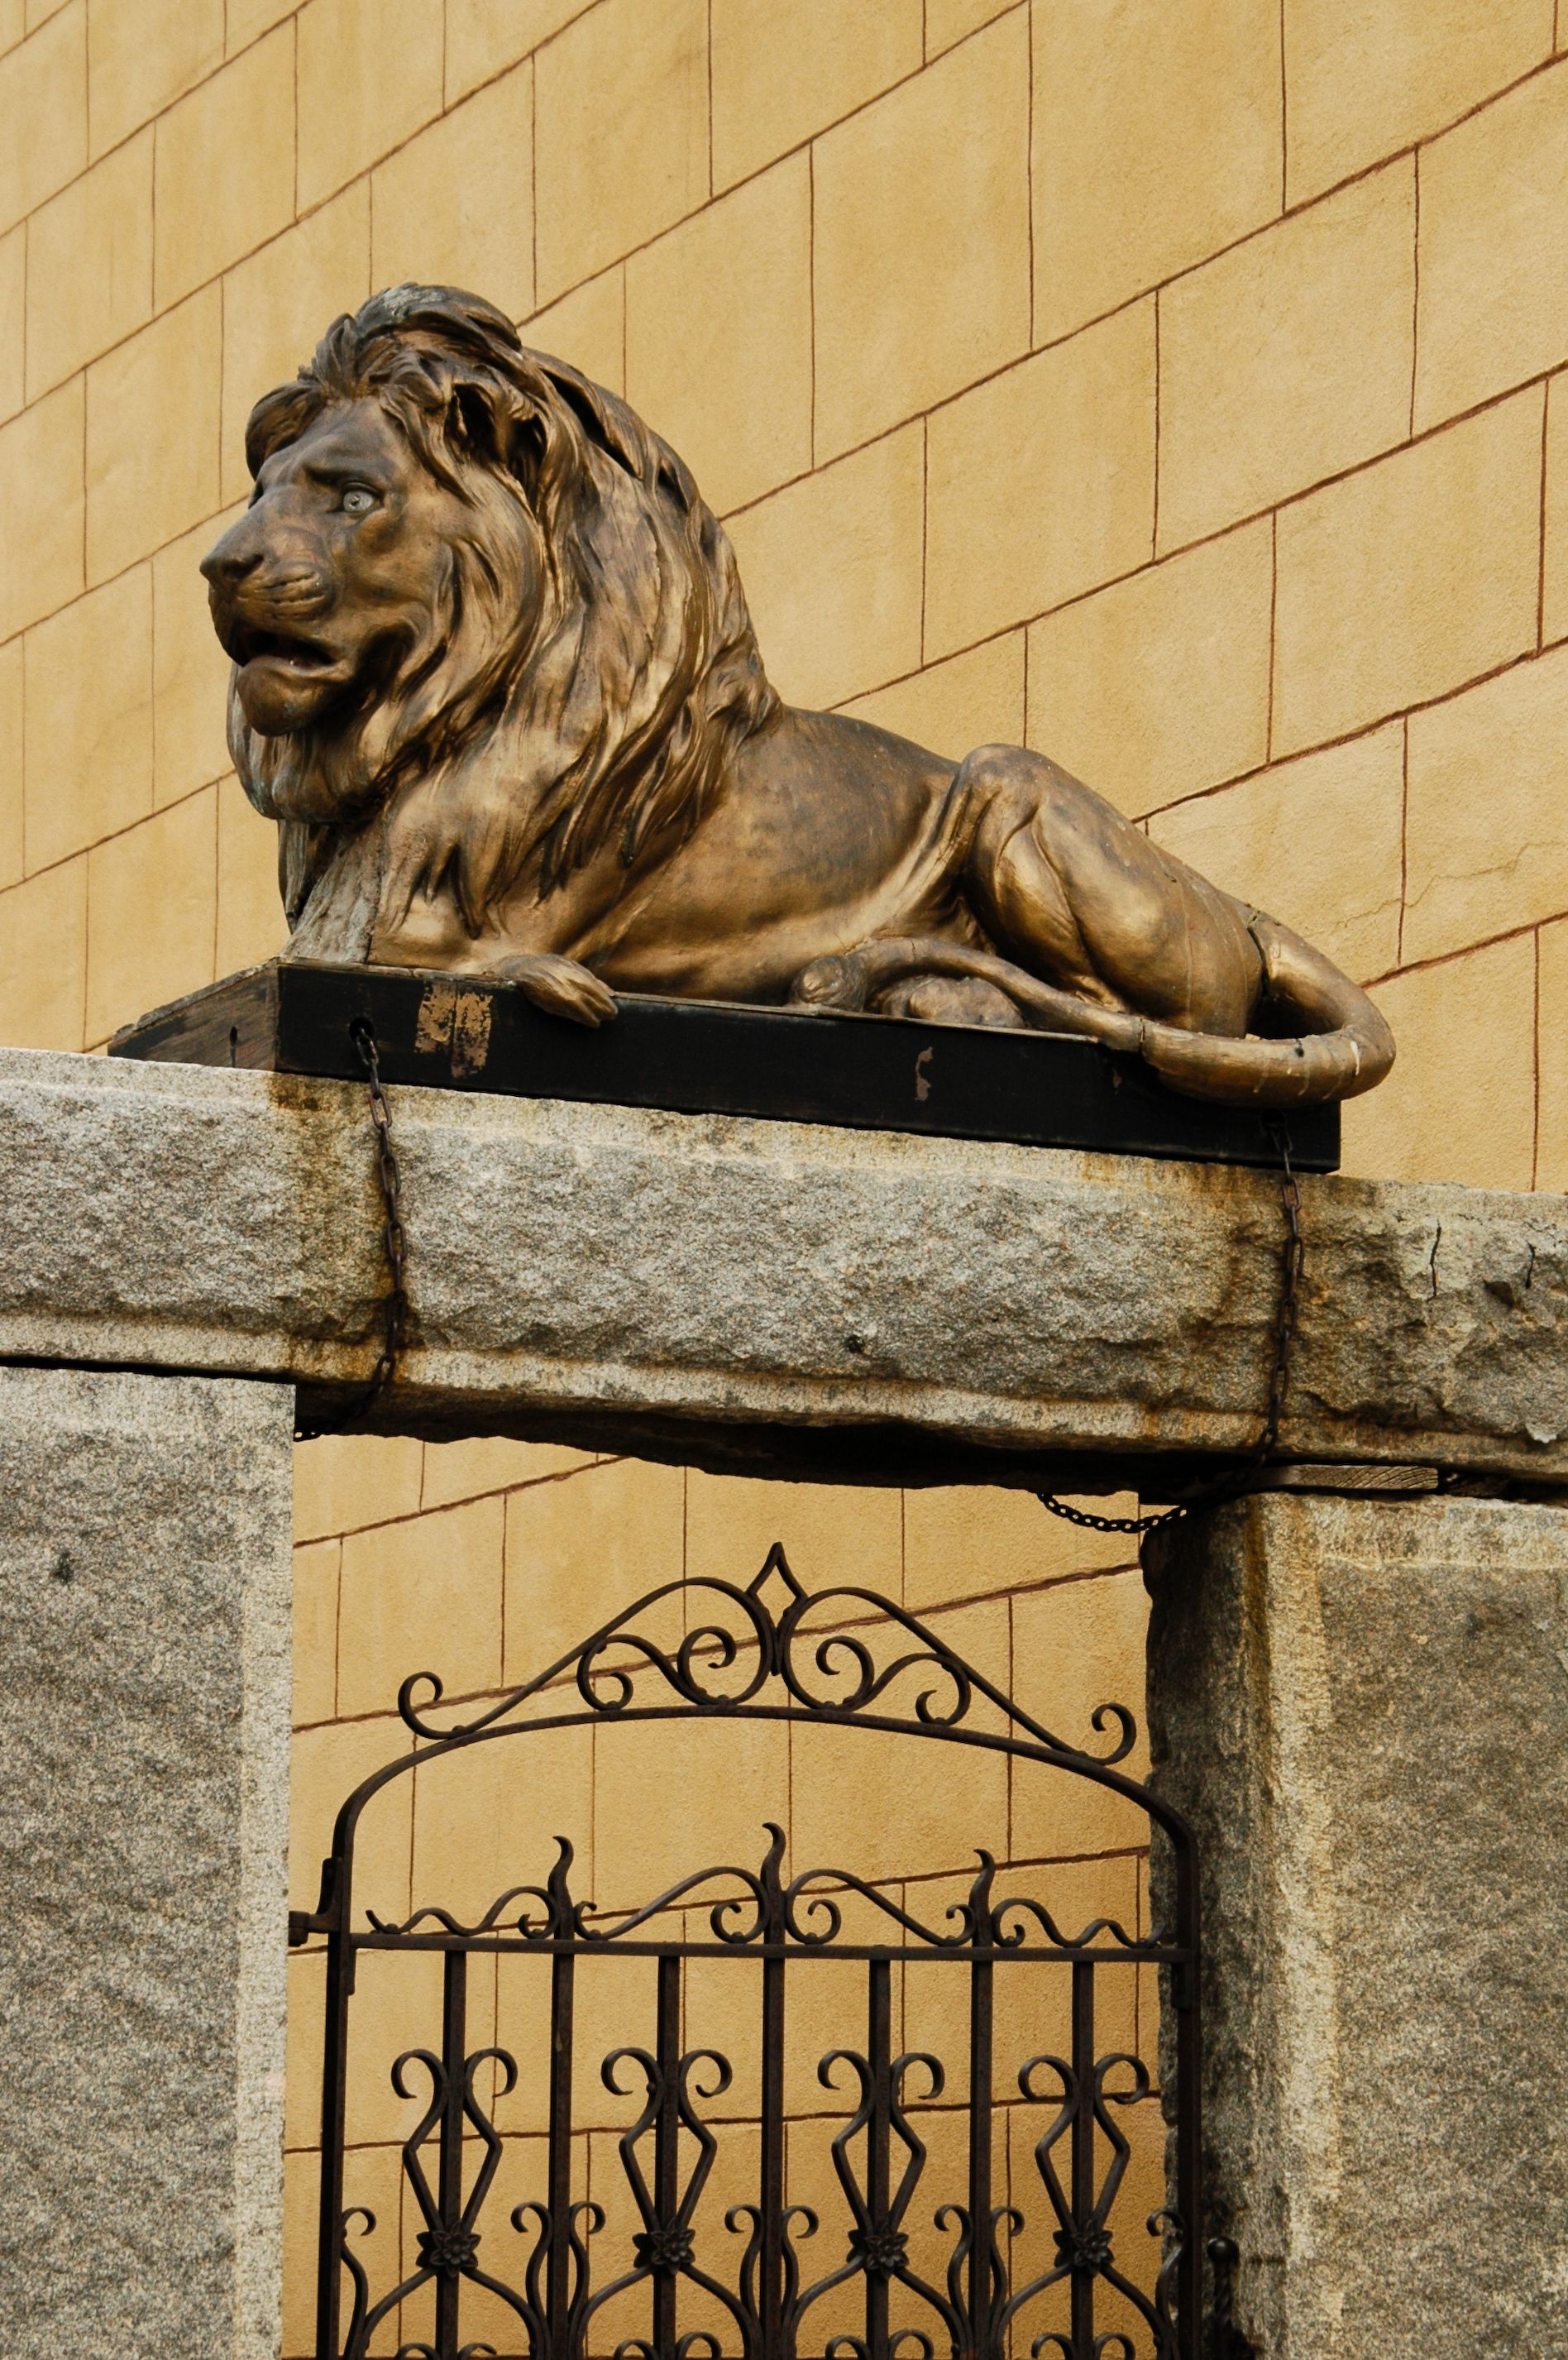 sitting lion sculpture google search art series idea reclining lion statue